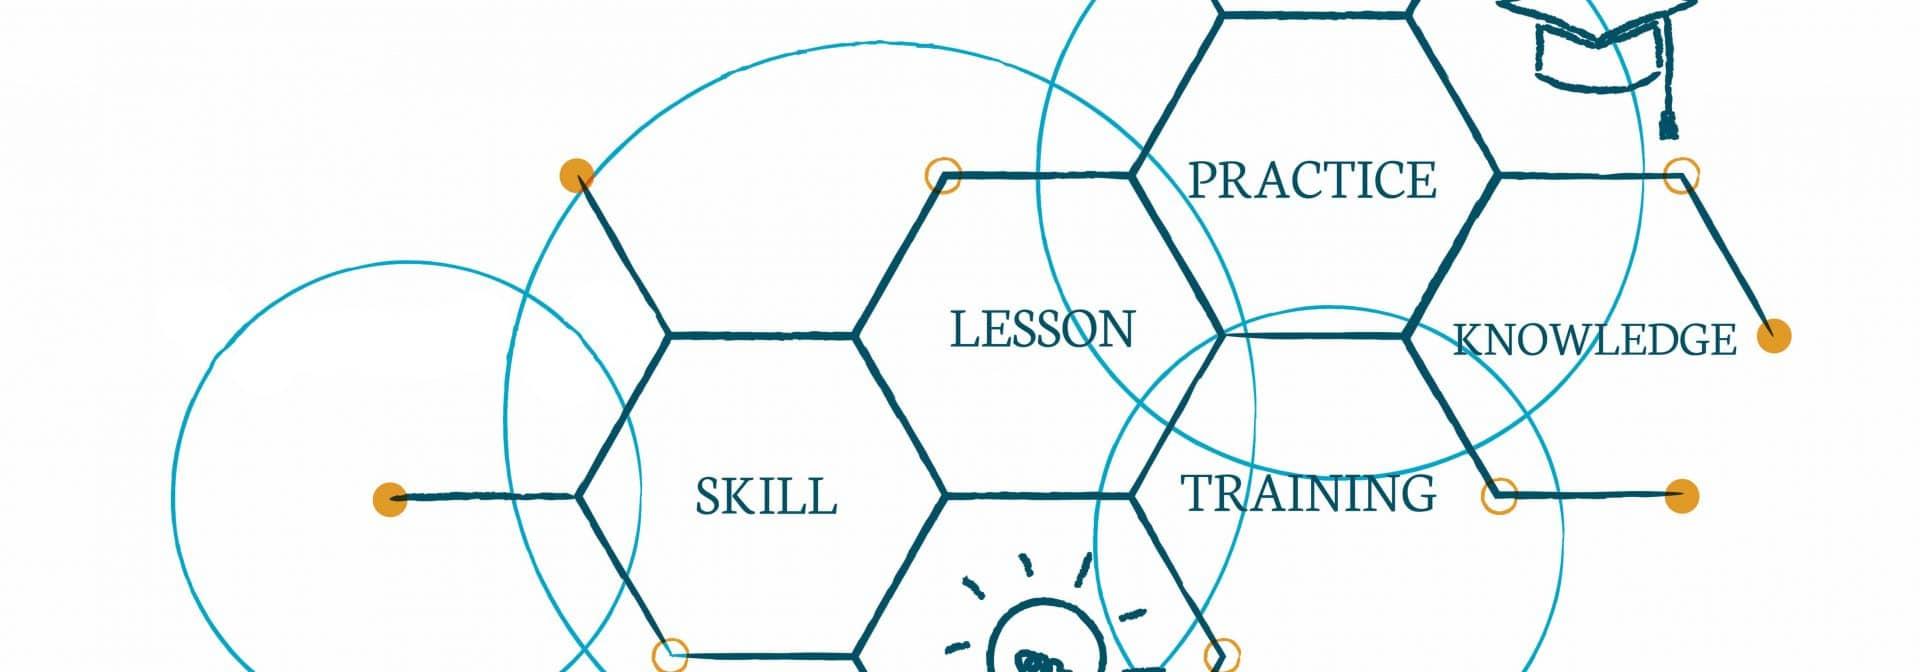 ELCEE academy webinar: gratis webinars